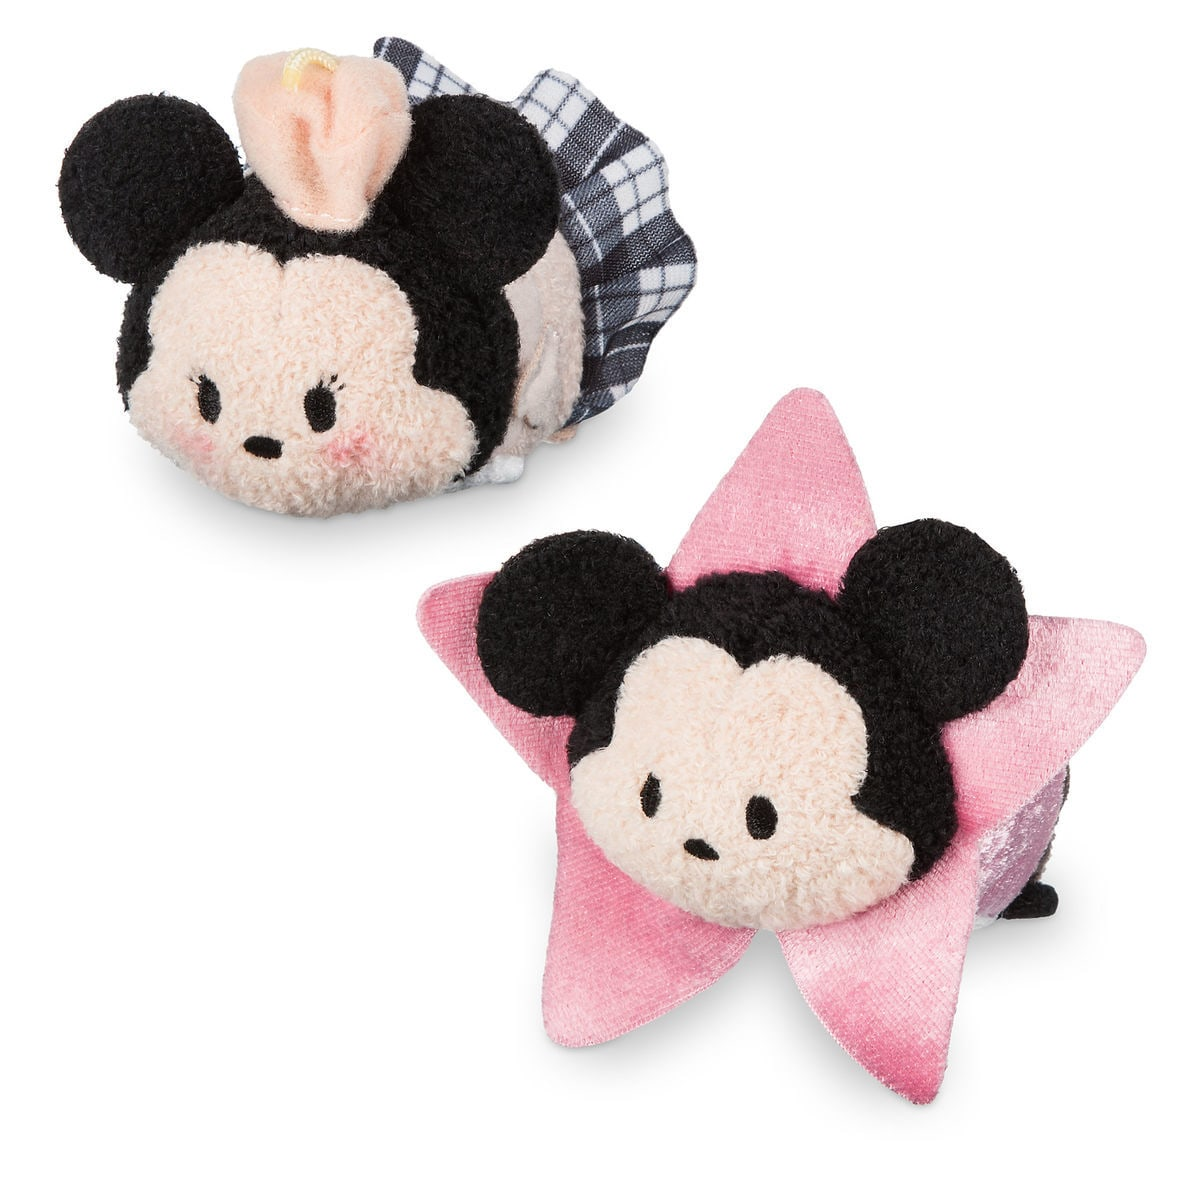 86ba4795d996 Mickey and Minnie Mouse   Tsum Tsum   Plush Set - Mini - 3 1 2 ...